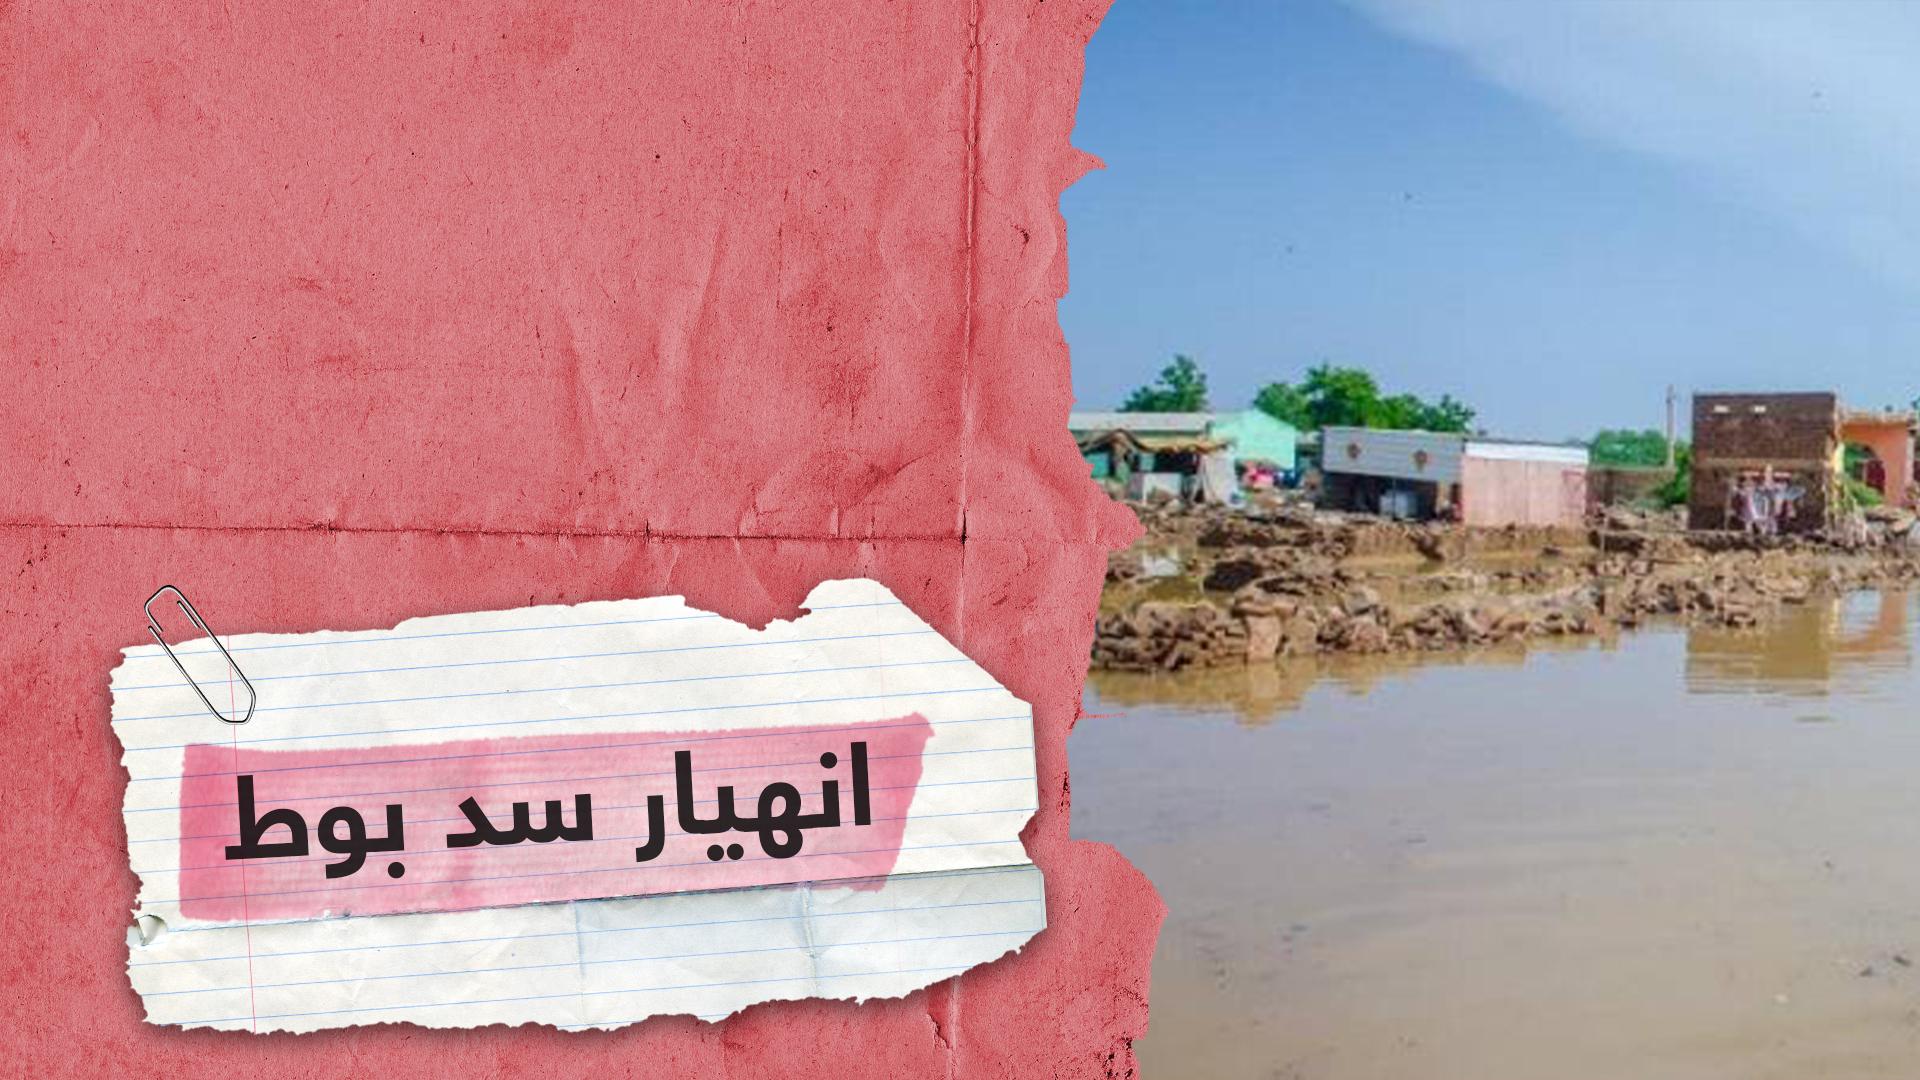 مشاهد مروعة لانهيار سد بوط السوداني